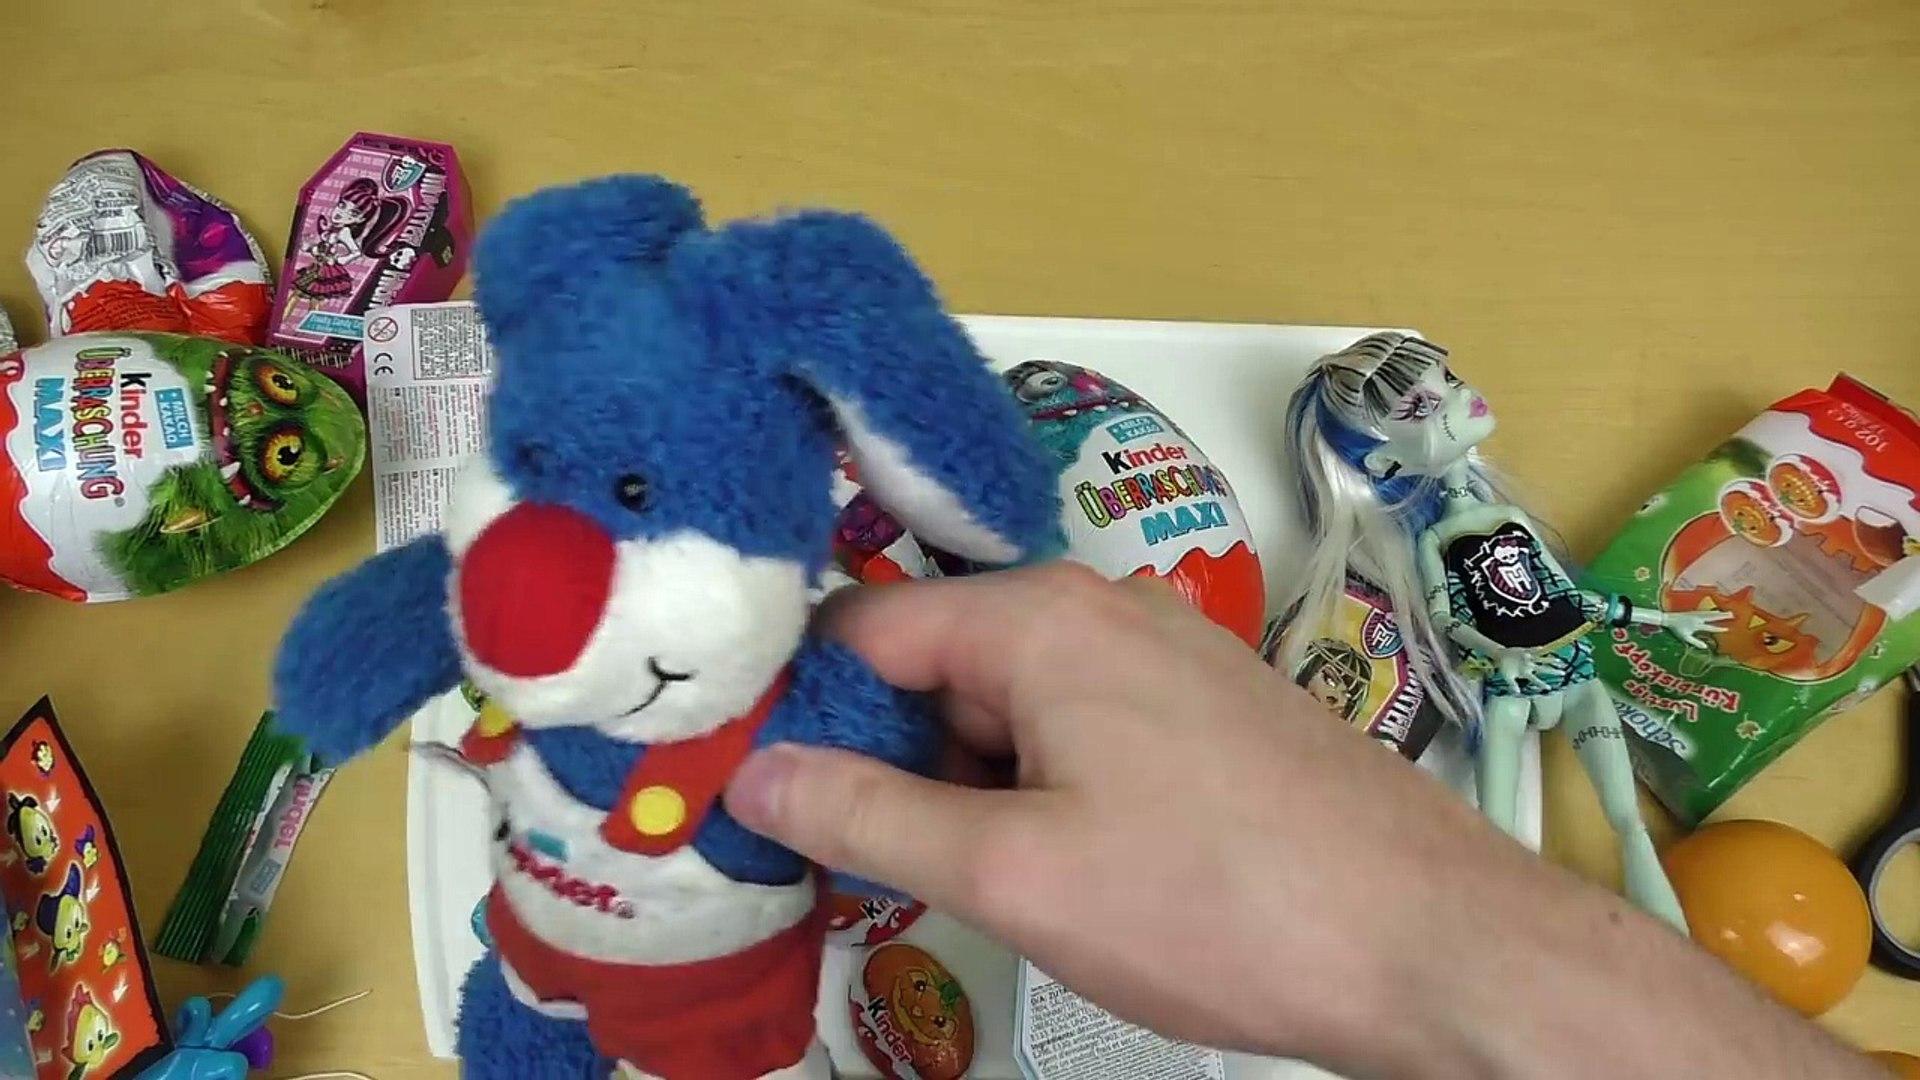 Kinder Surprise MAXI HALLOWEEN Monster High Candy Coffins